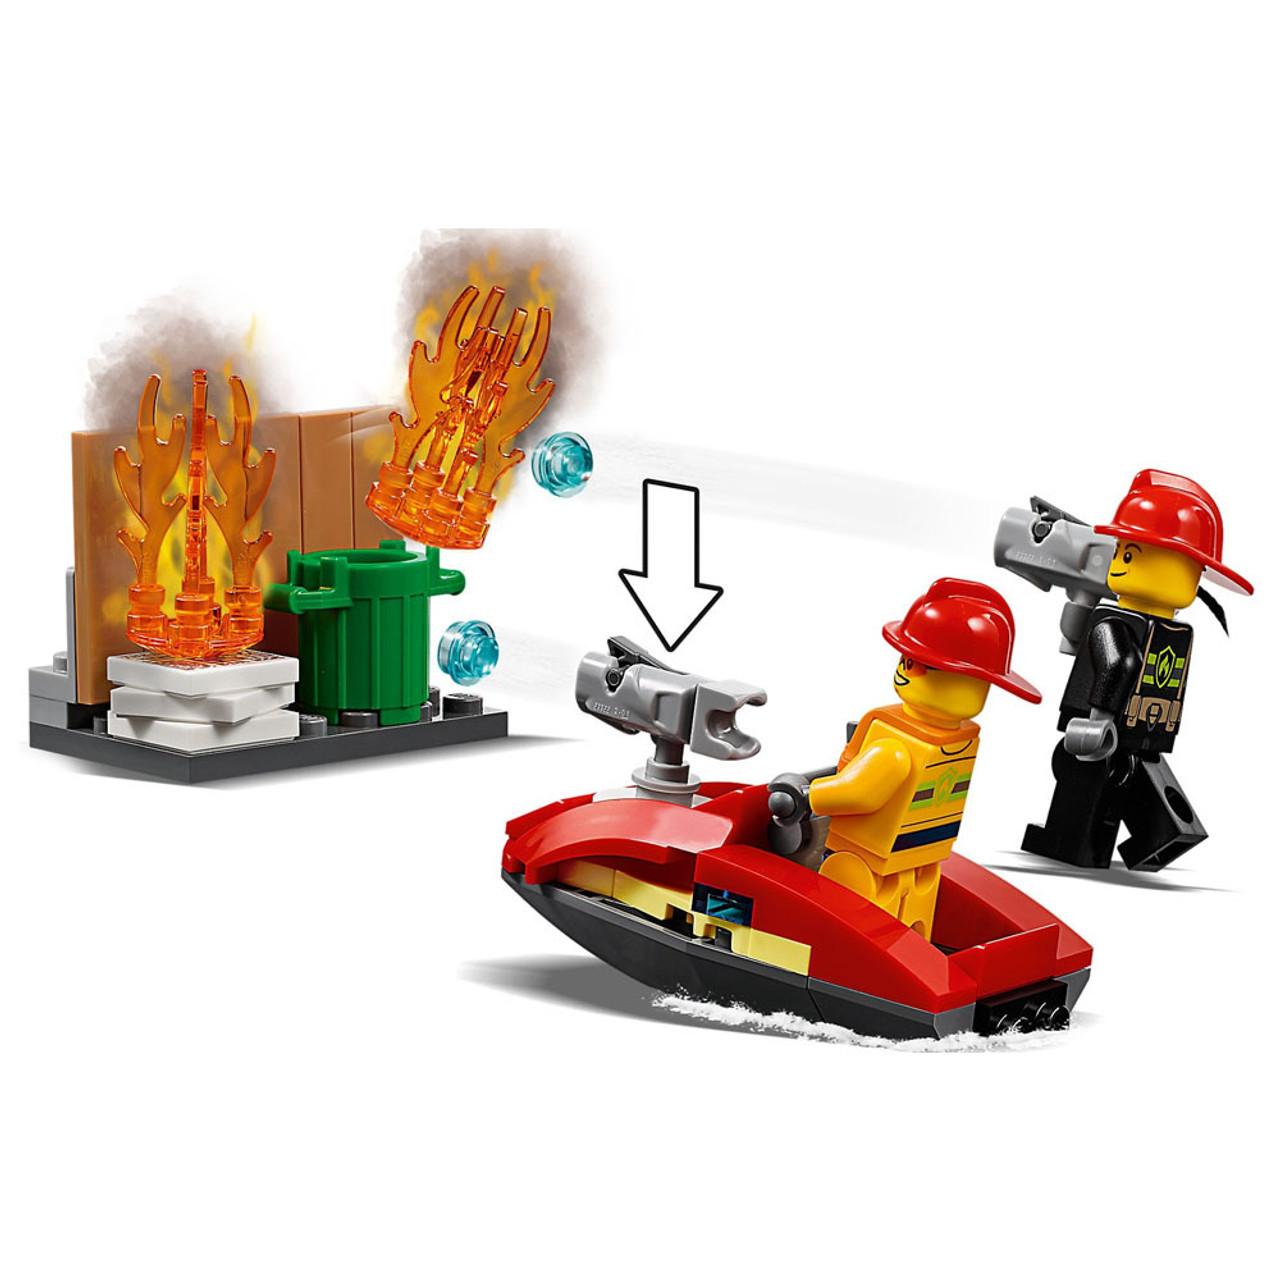 FIRE STATION W2